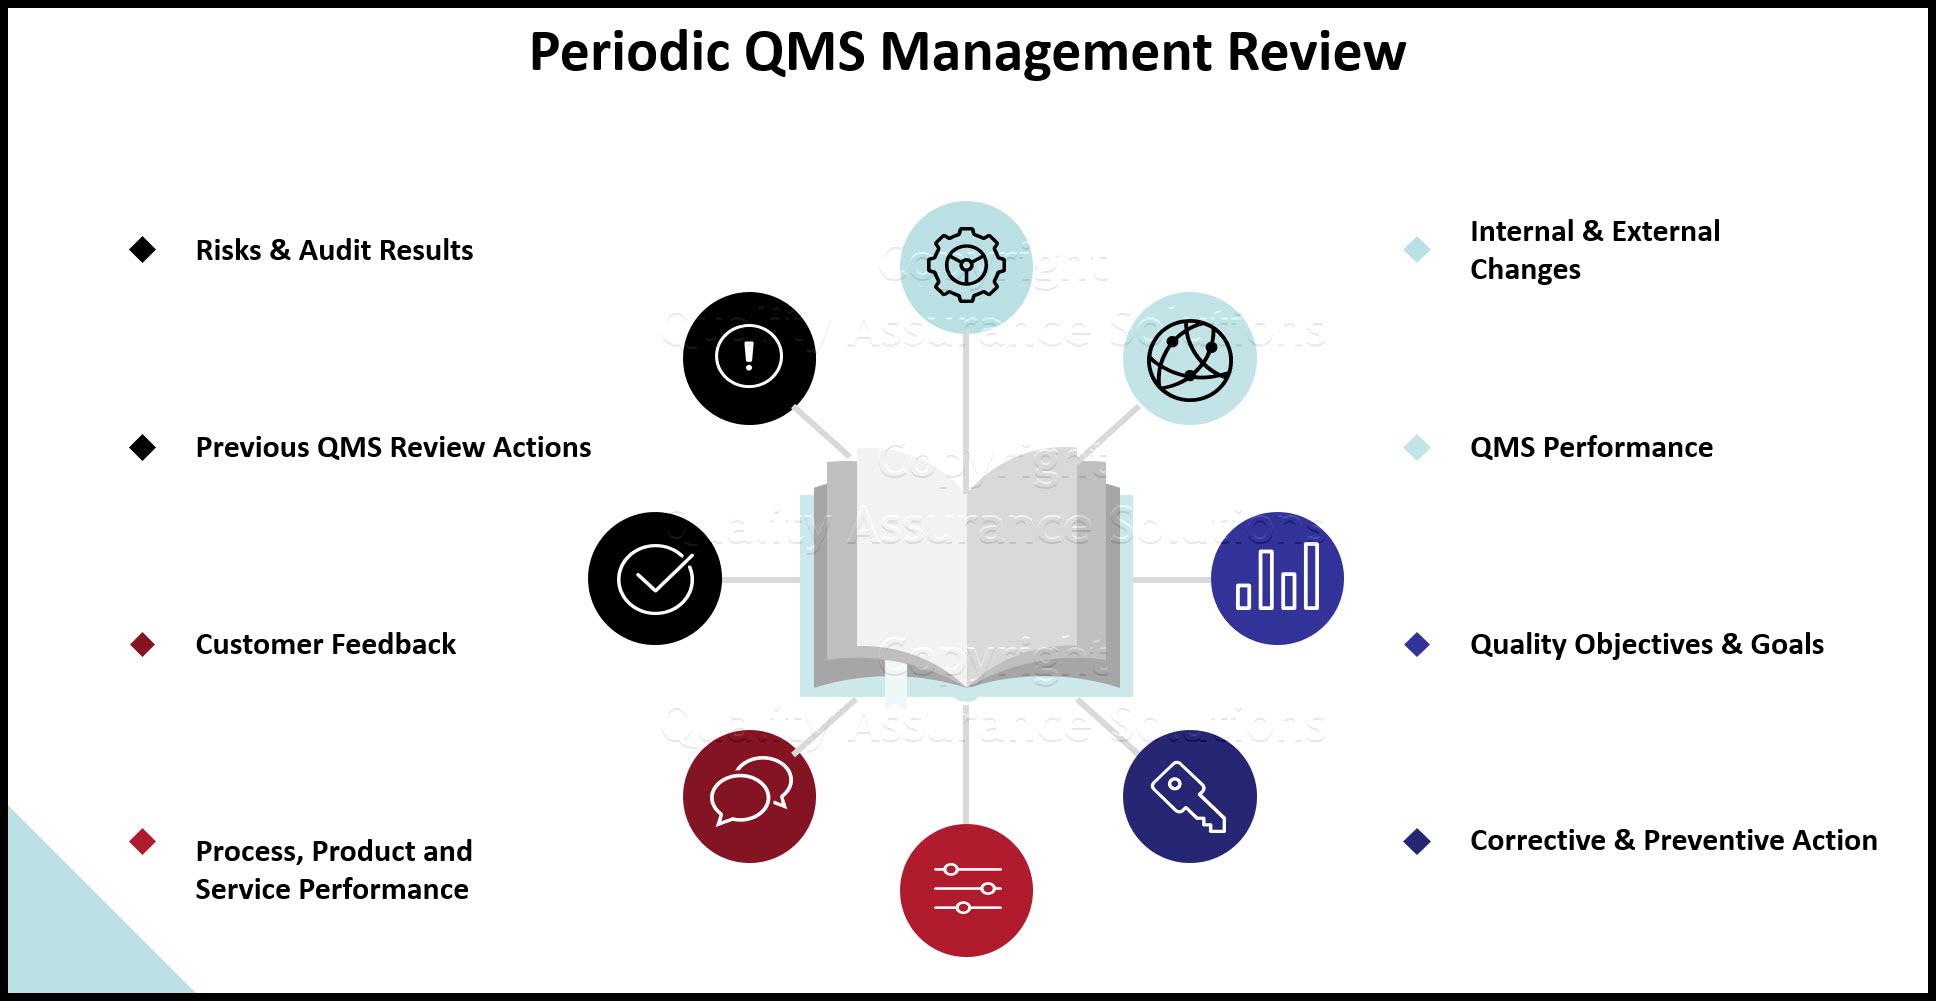 program management review business slide